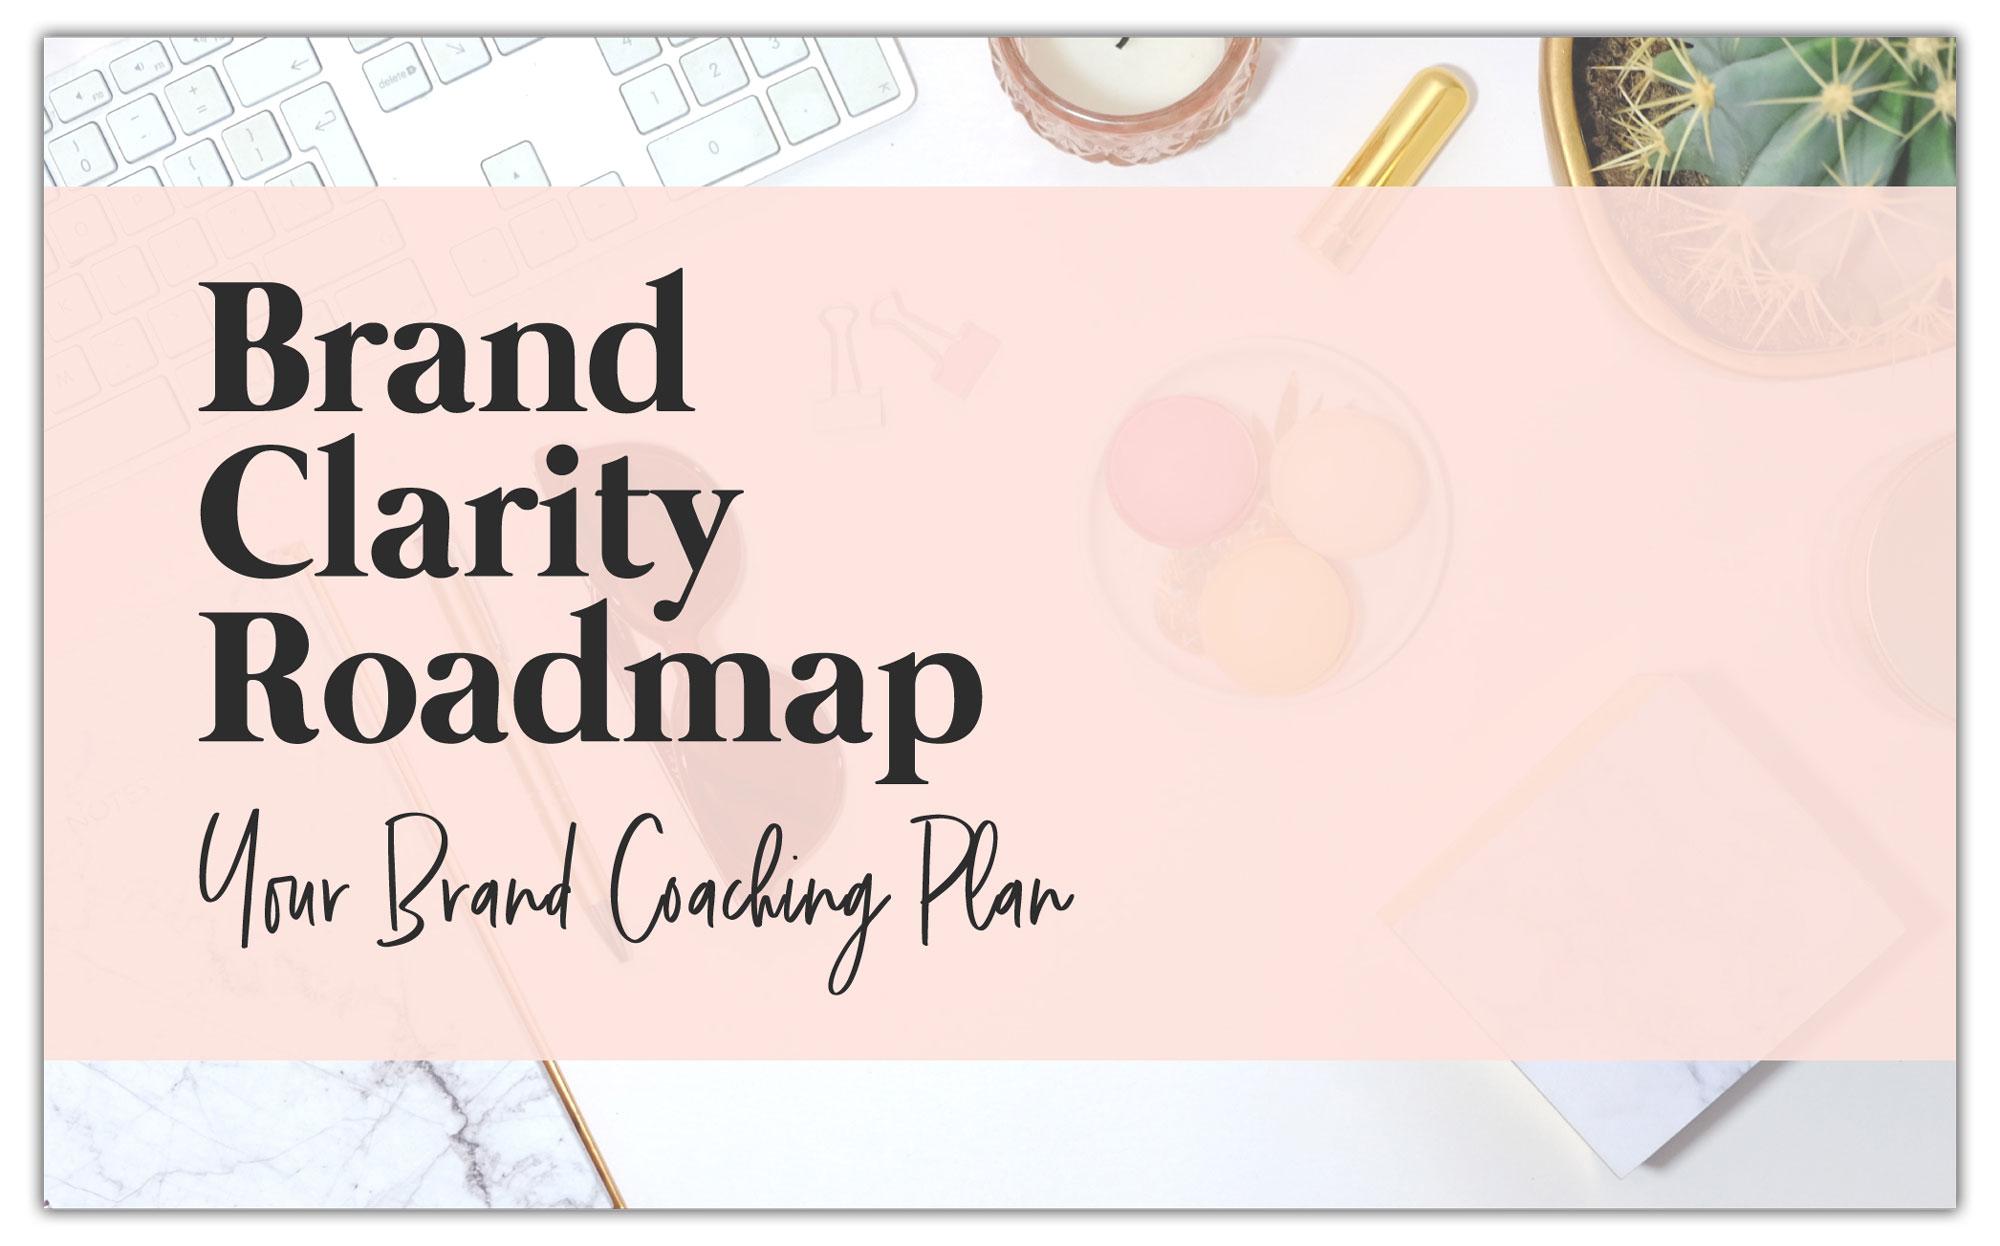 Brand Clarity Roadmap | Tiffany Atkinson Consulting | tiffanyatkinson.com